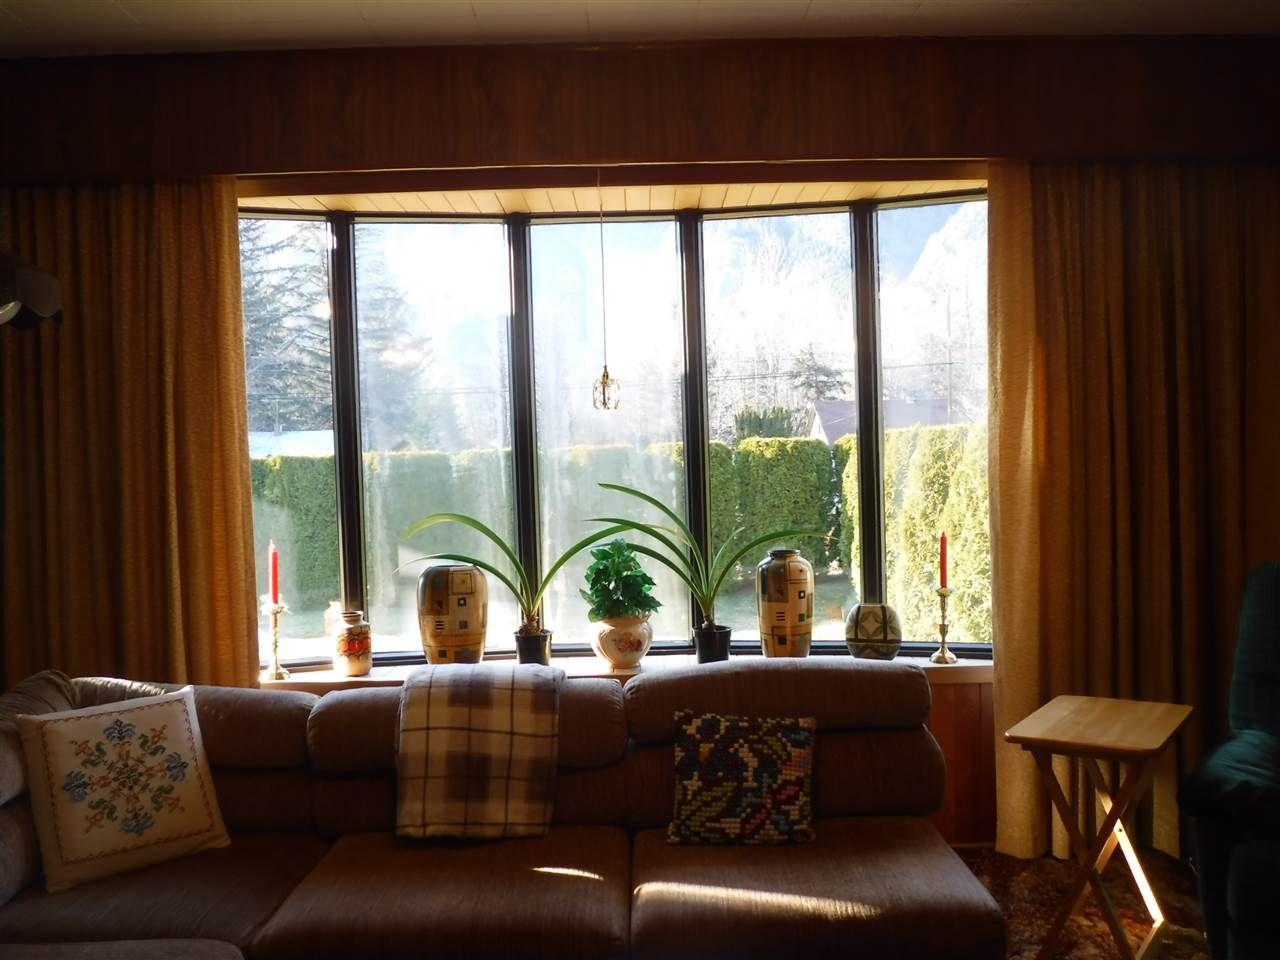 Photo 12: Photos: 1599 MACKENZIE Highway in Bella Coola: Bella Coola/Hagensborg House for sale (Williams Lake (Zone 27))  : MLS®# R2449026